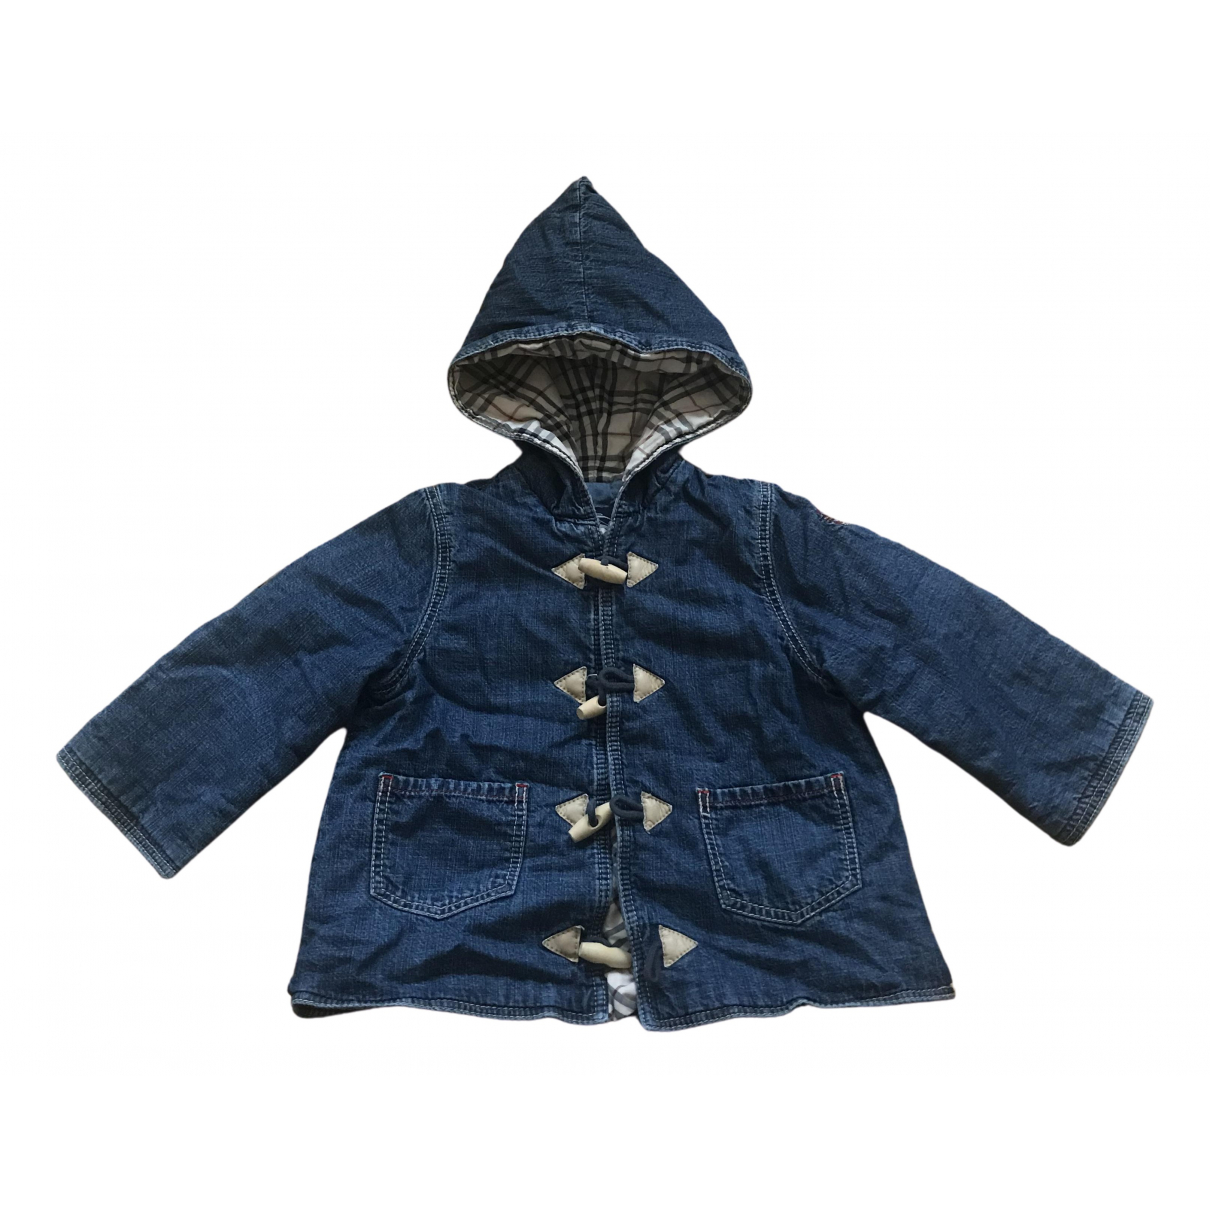 Burberry \N Jacke, Maentel in  Blau Denim - Jeans